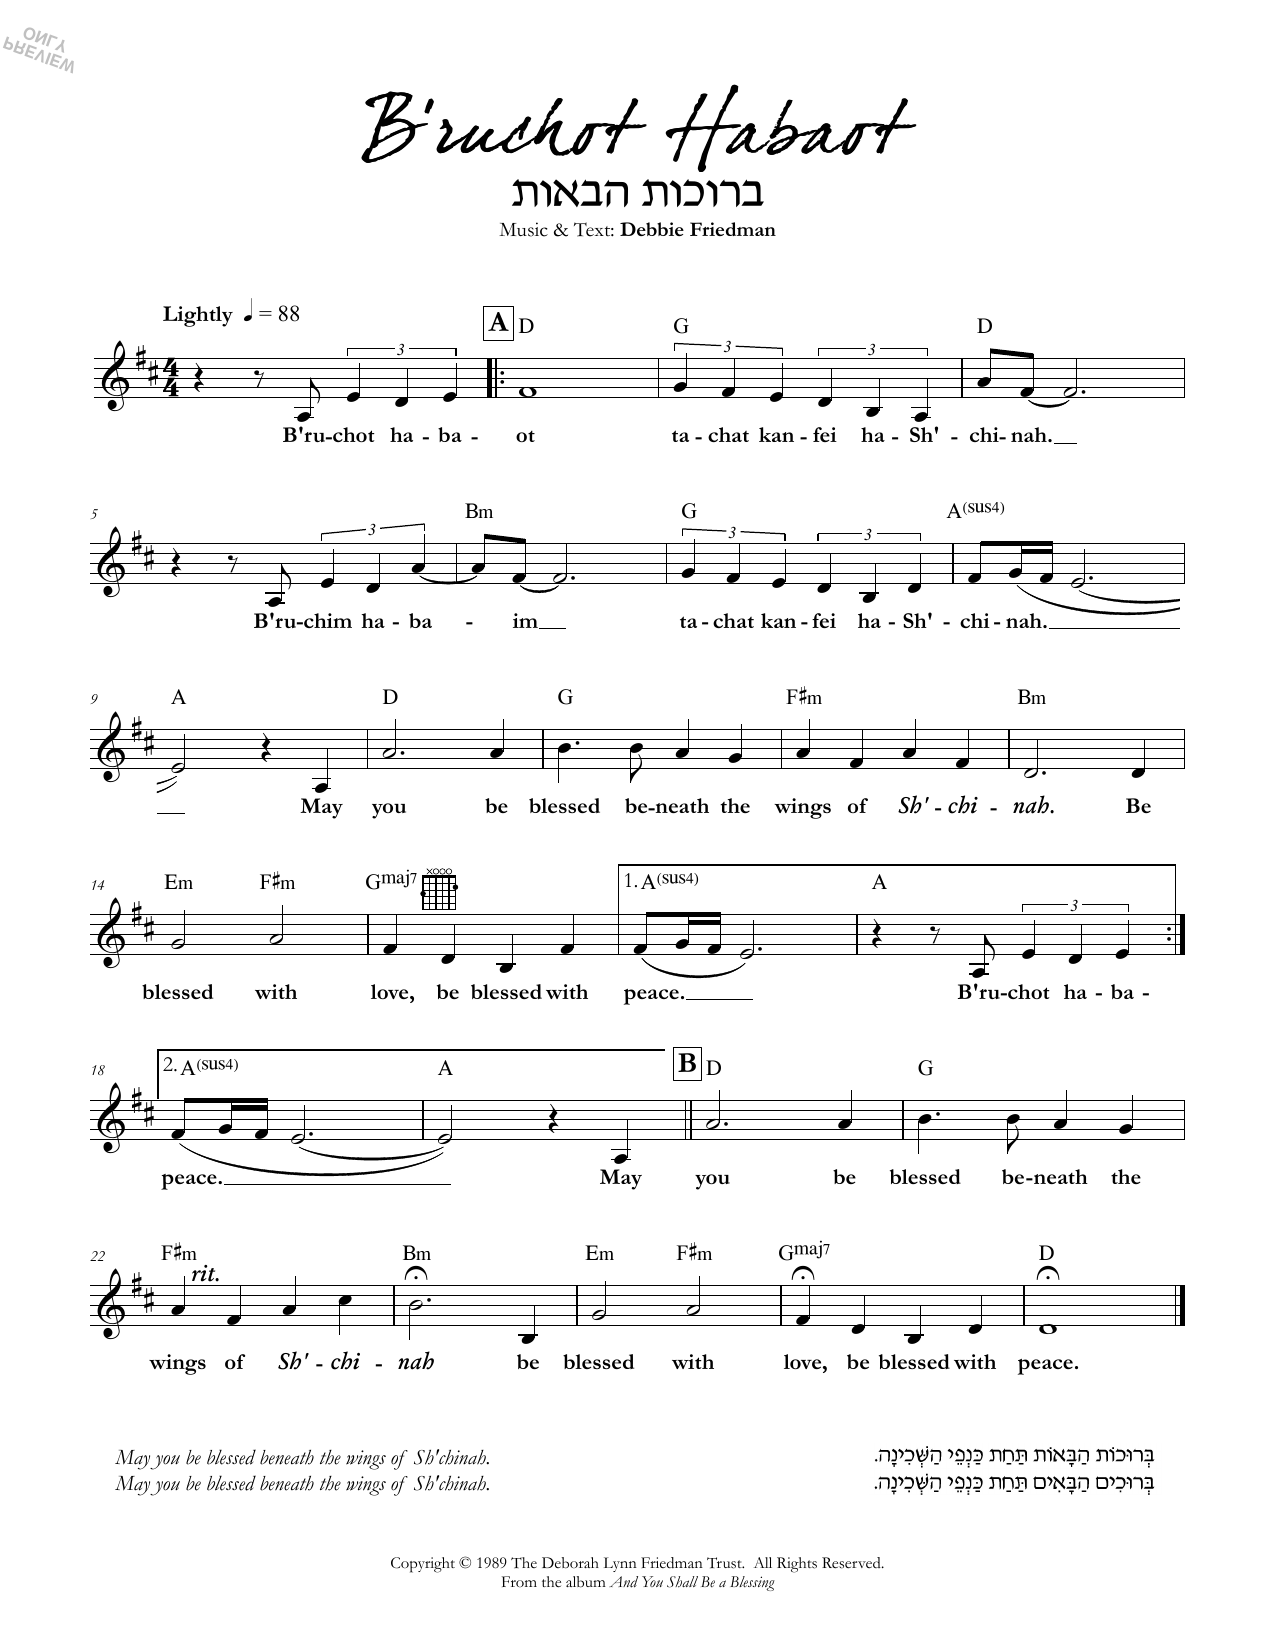 B'ruchot Habaot Sheet Music